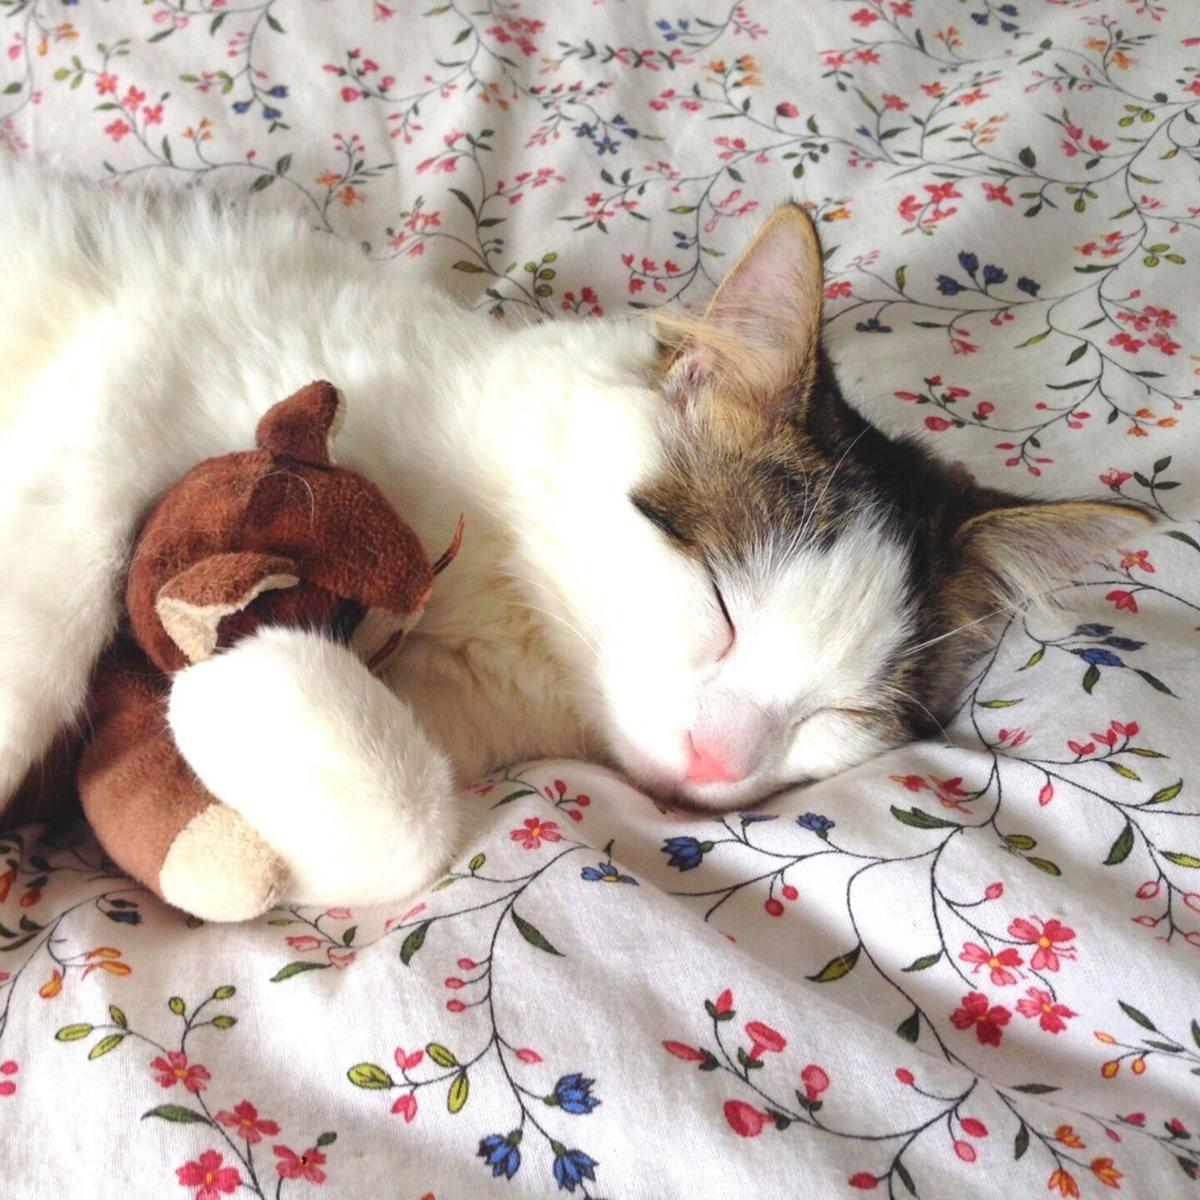 bon pet supply cat toy.jpg